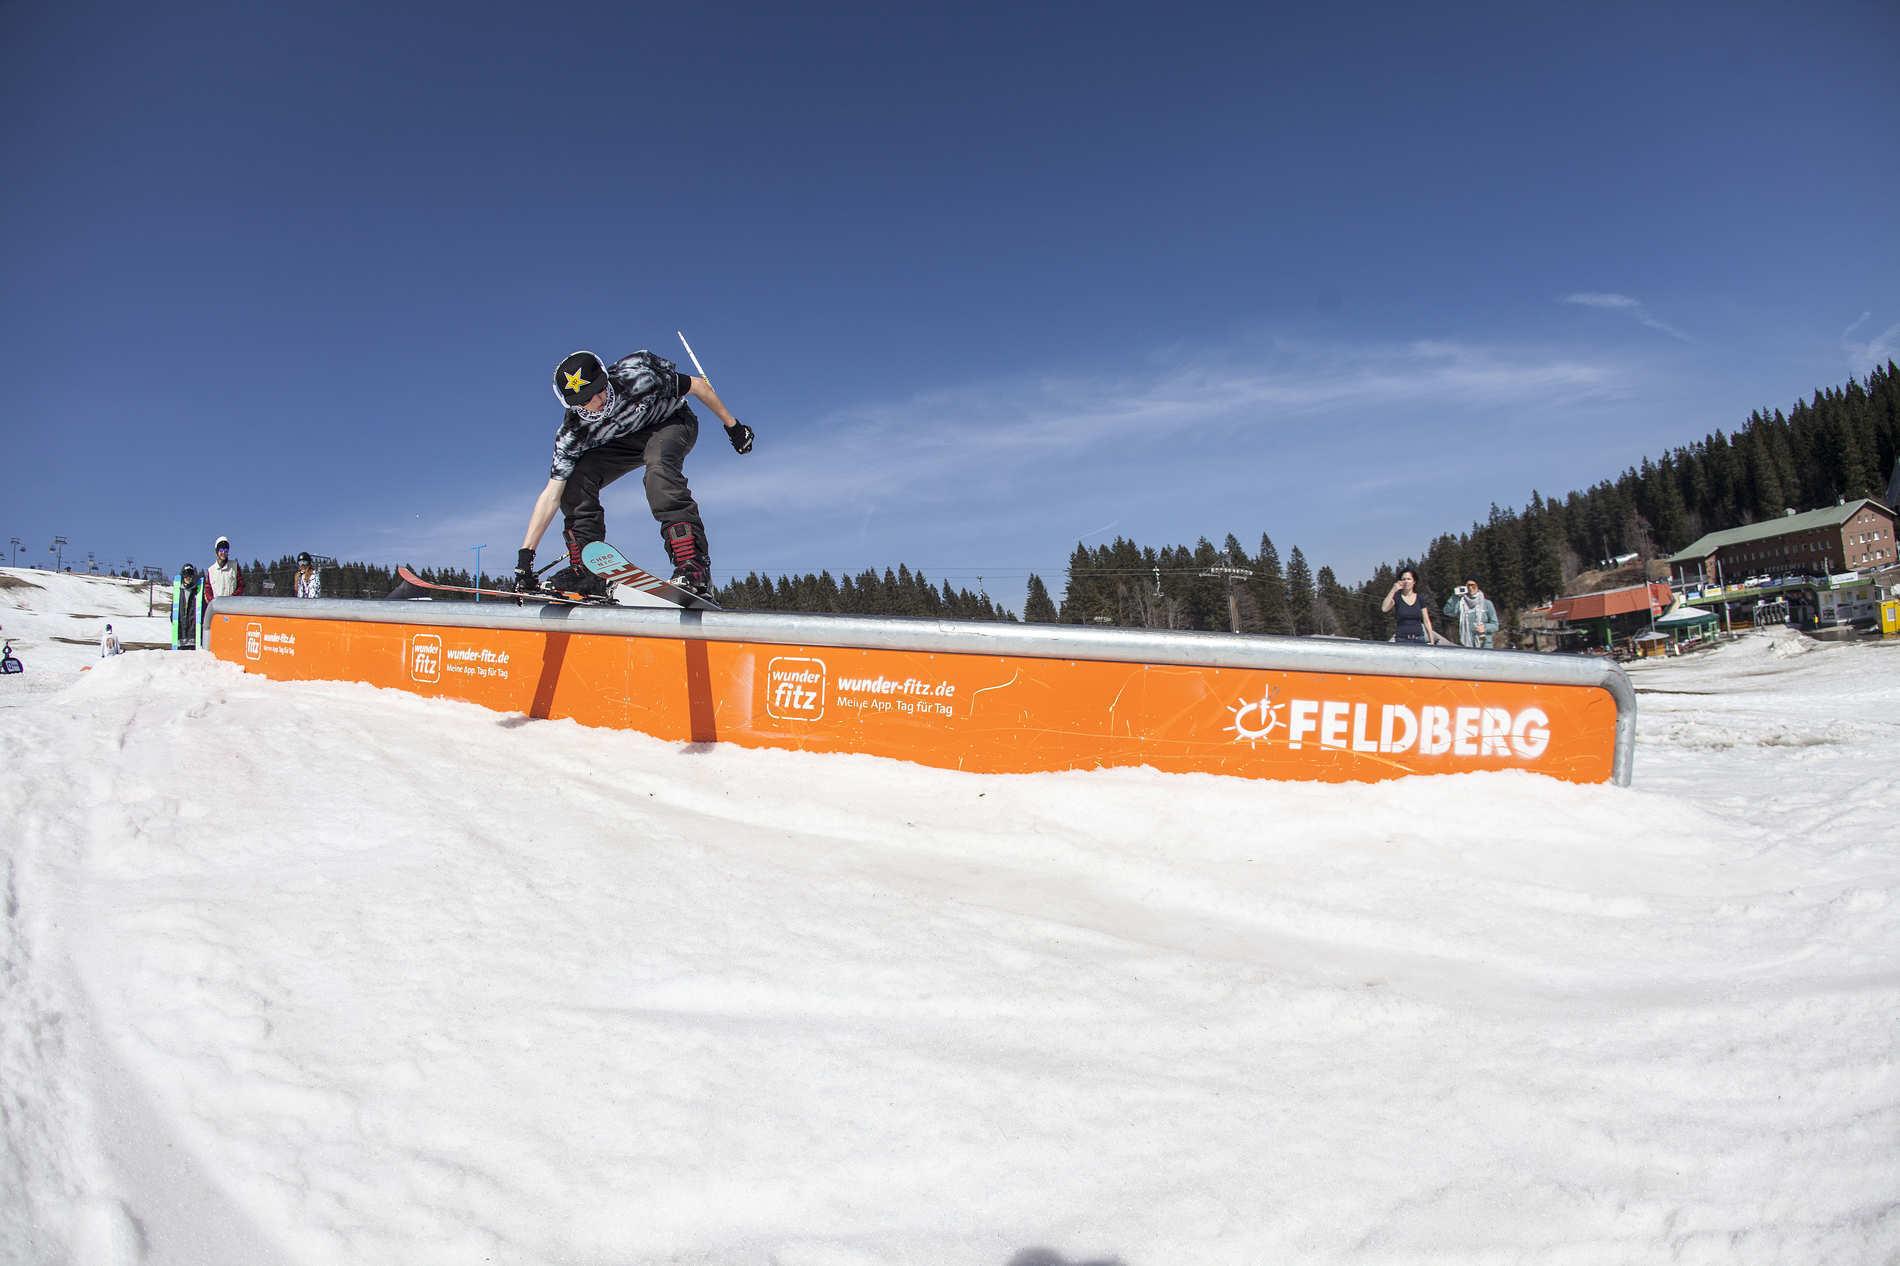 web snowpark feldberg 25 03 2017 action fs unknown martin herrmann qparks 19